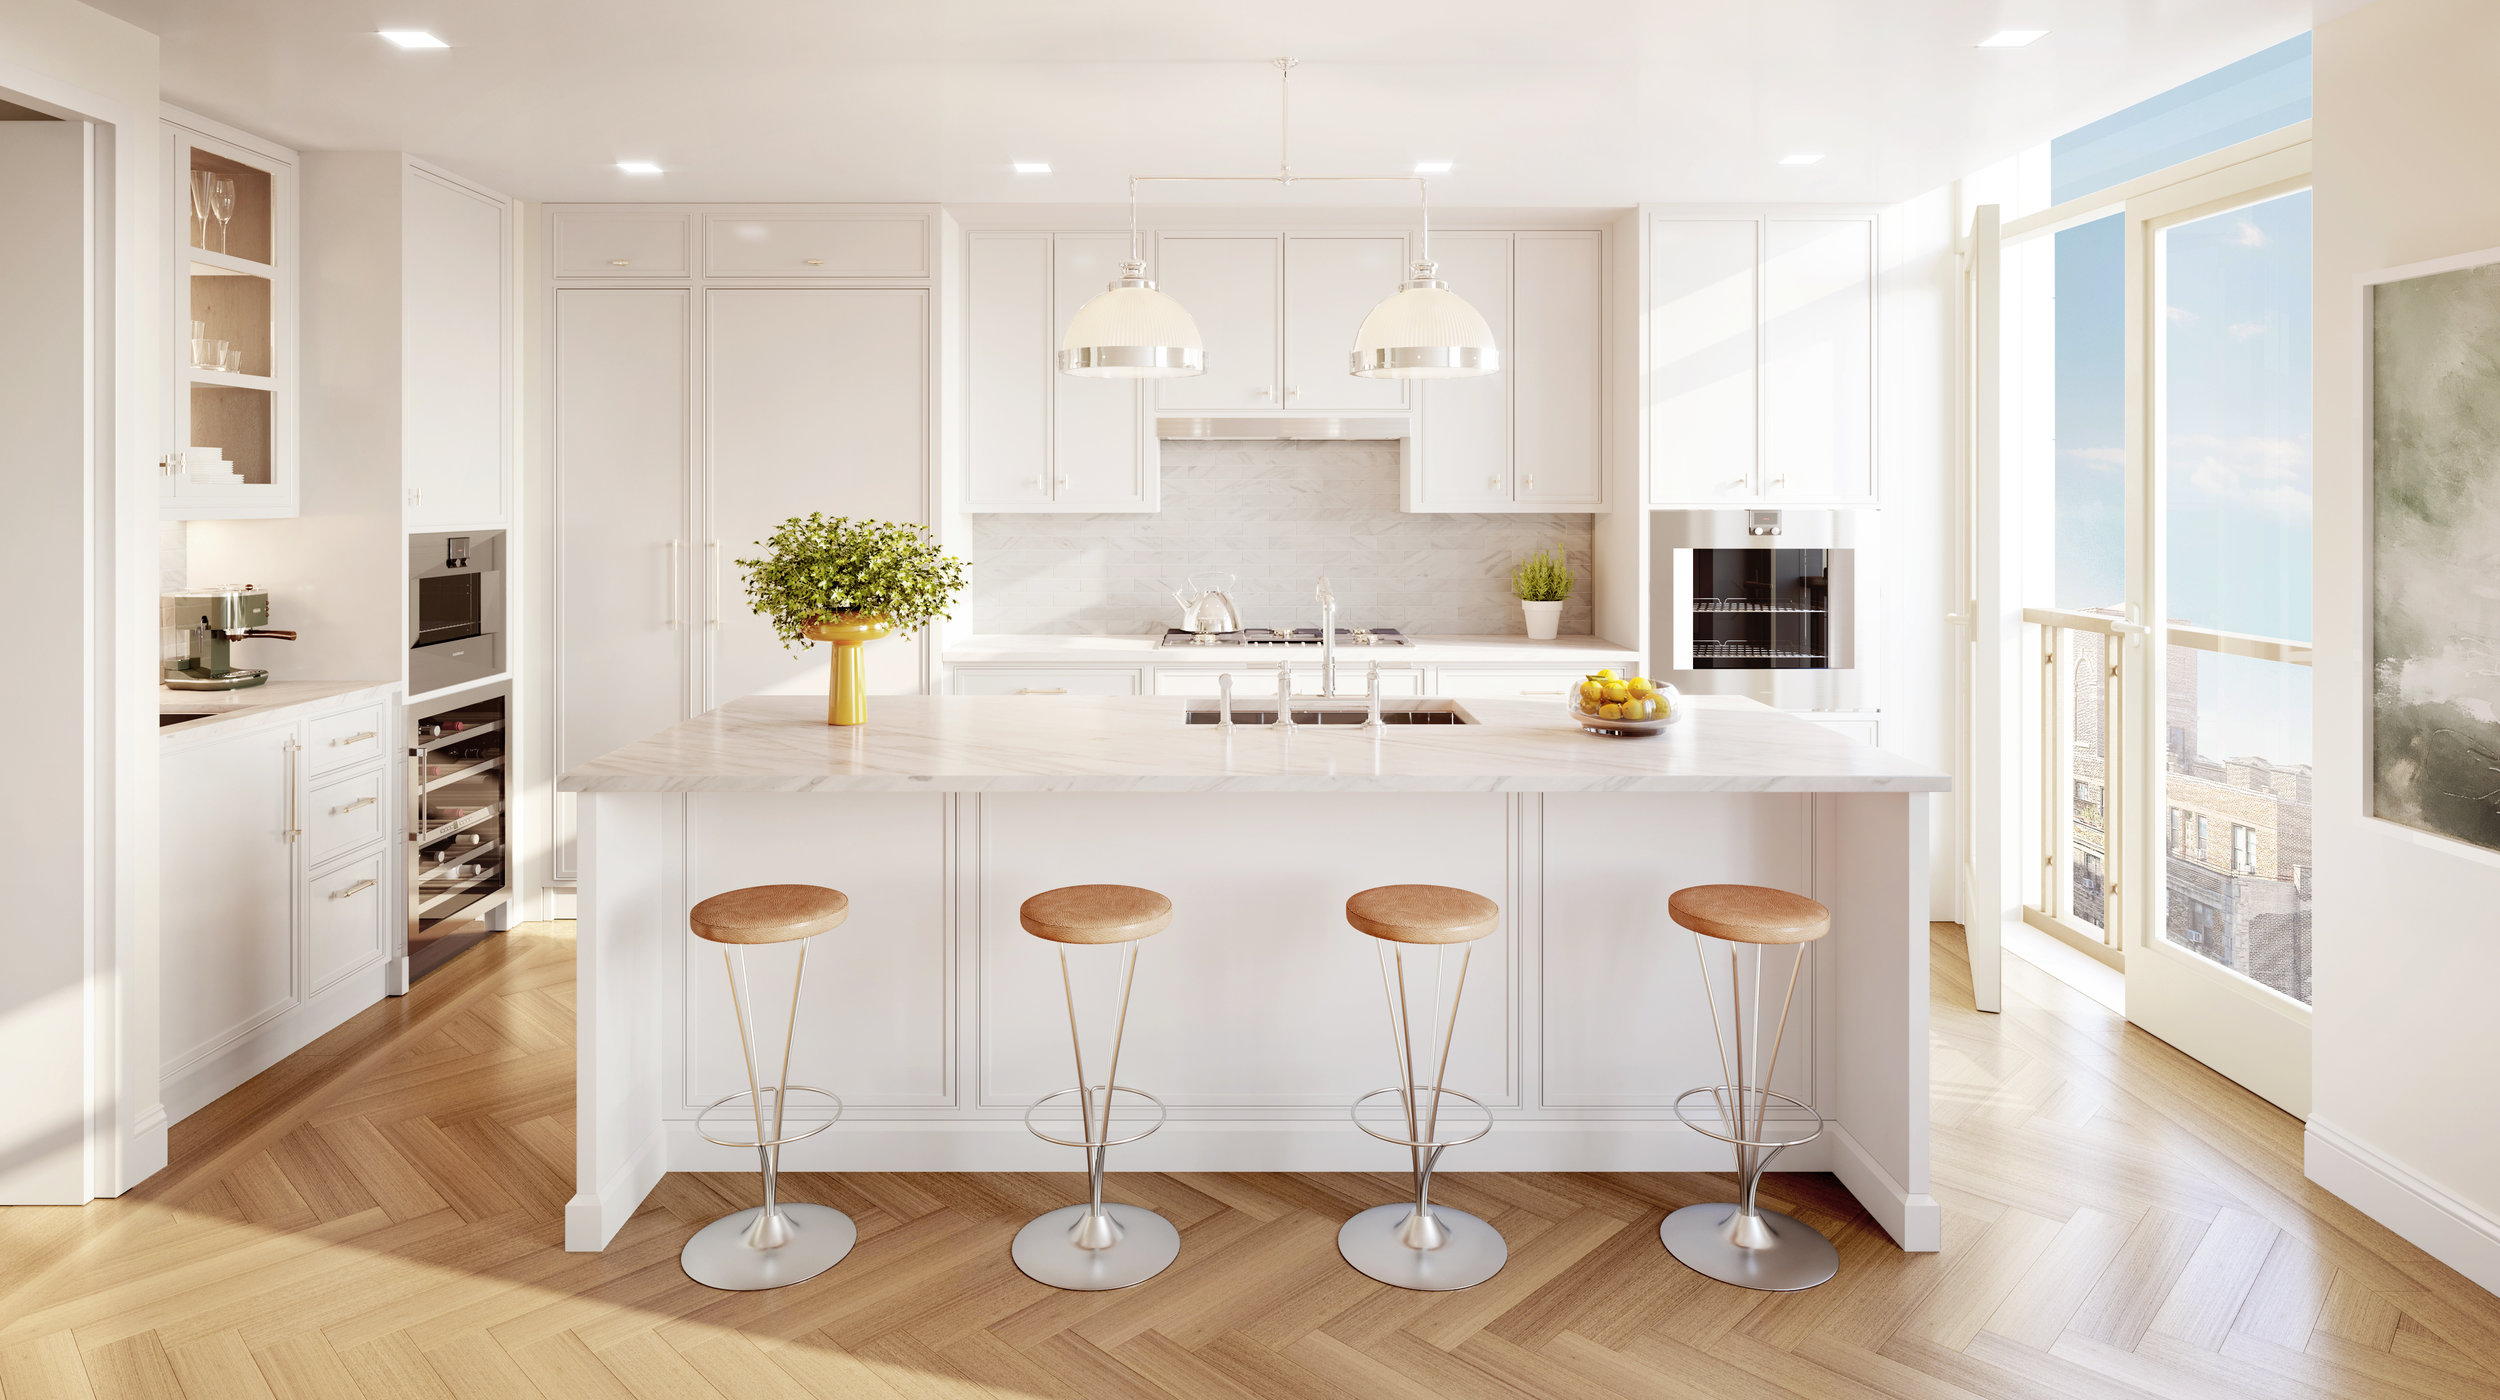 10 kitchen 6a_6k_171027d2-crop_JR.jpg